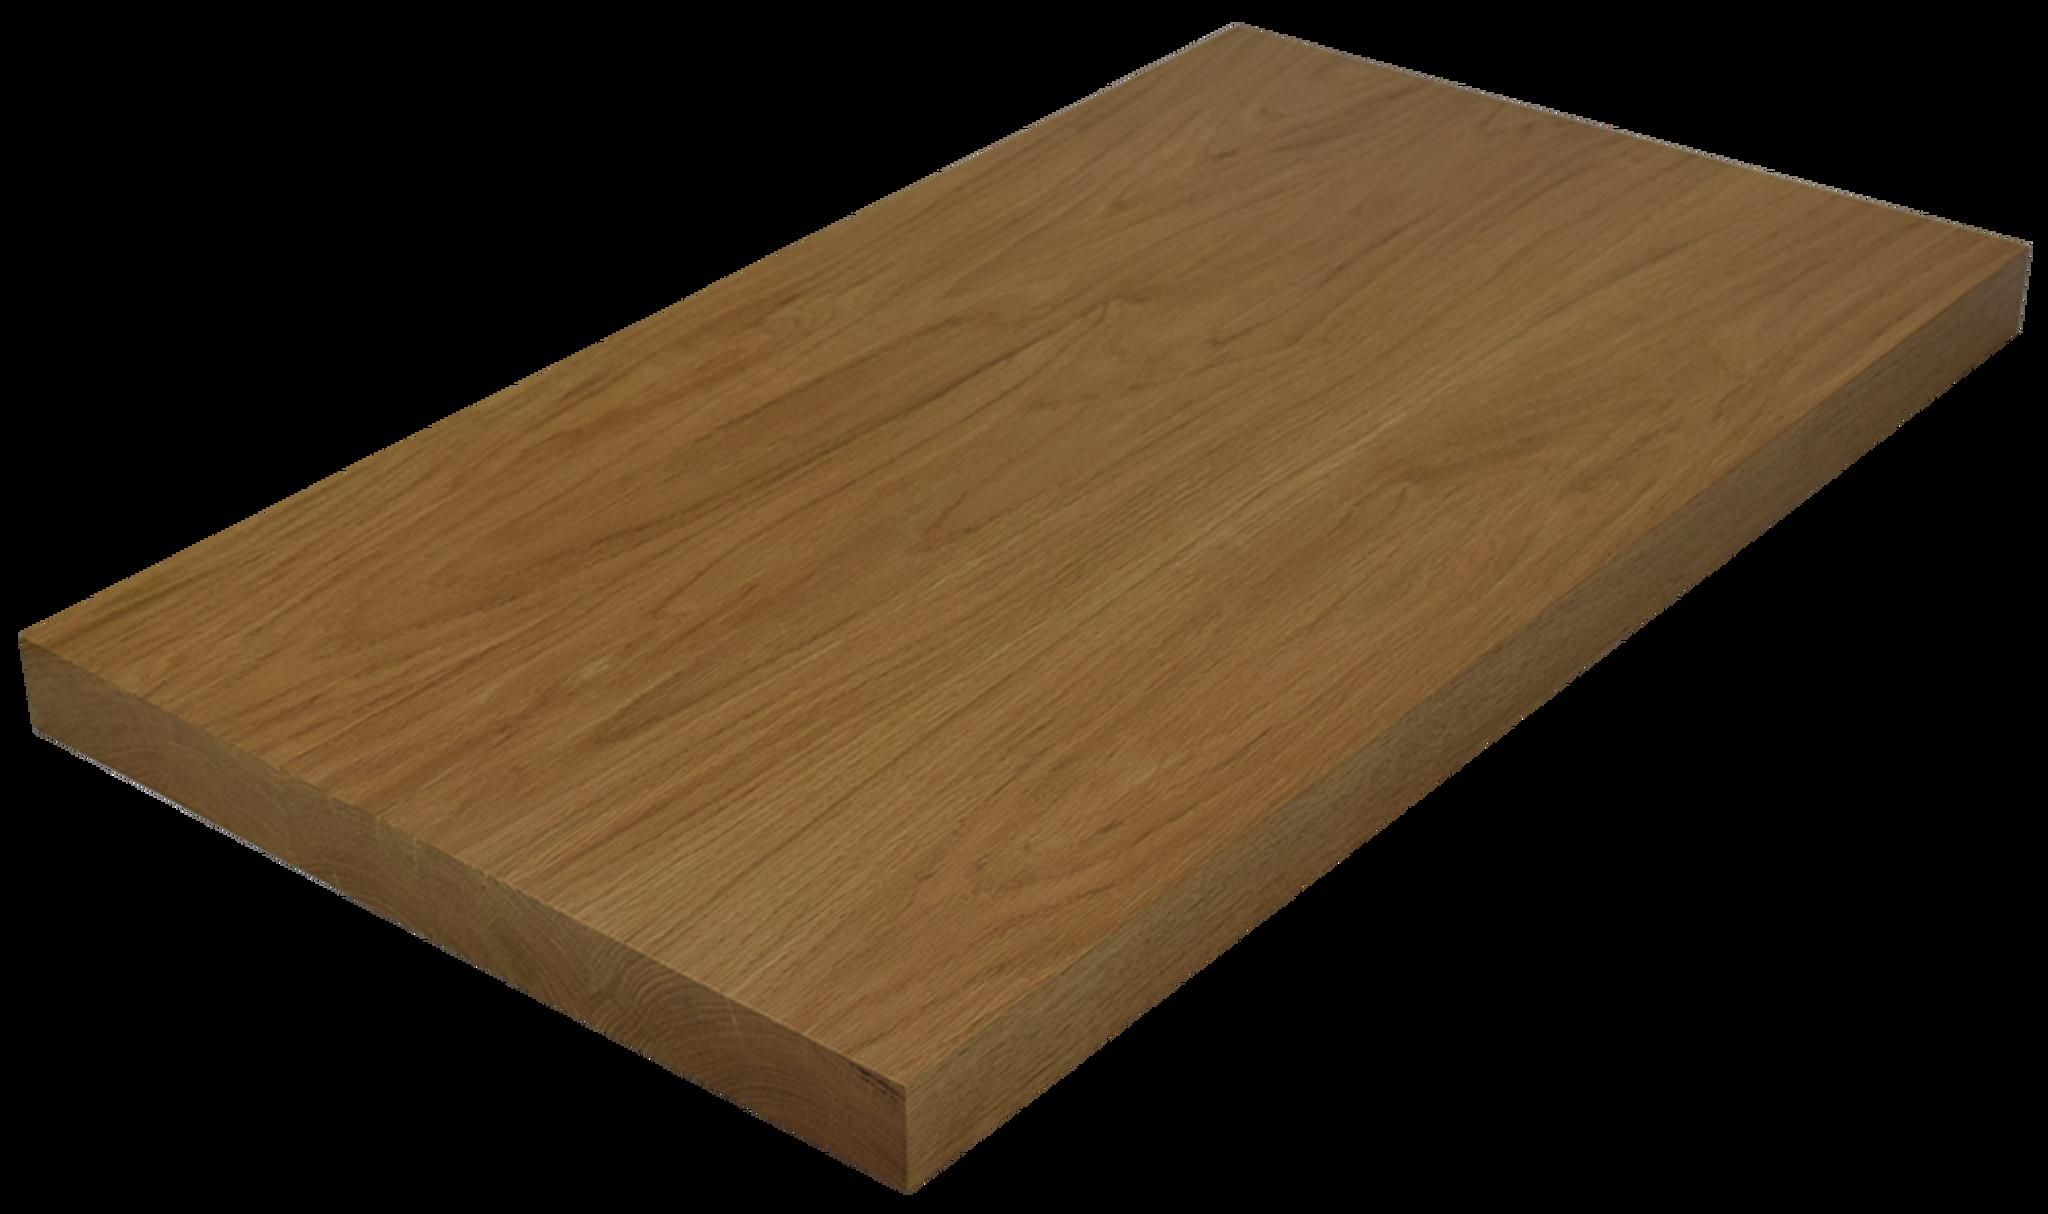 white oak wide plank face grain countertop hardwood lumber company. Black Bedroom Furniture Sets. Home Design Ideas